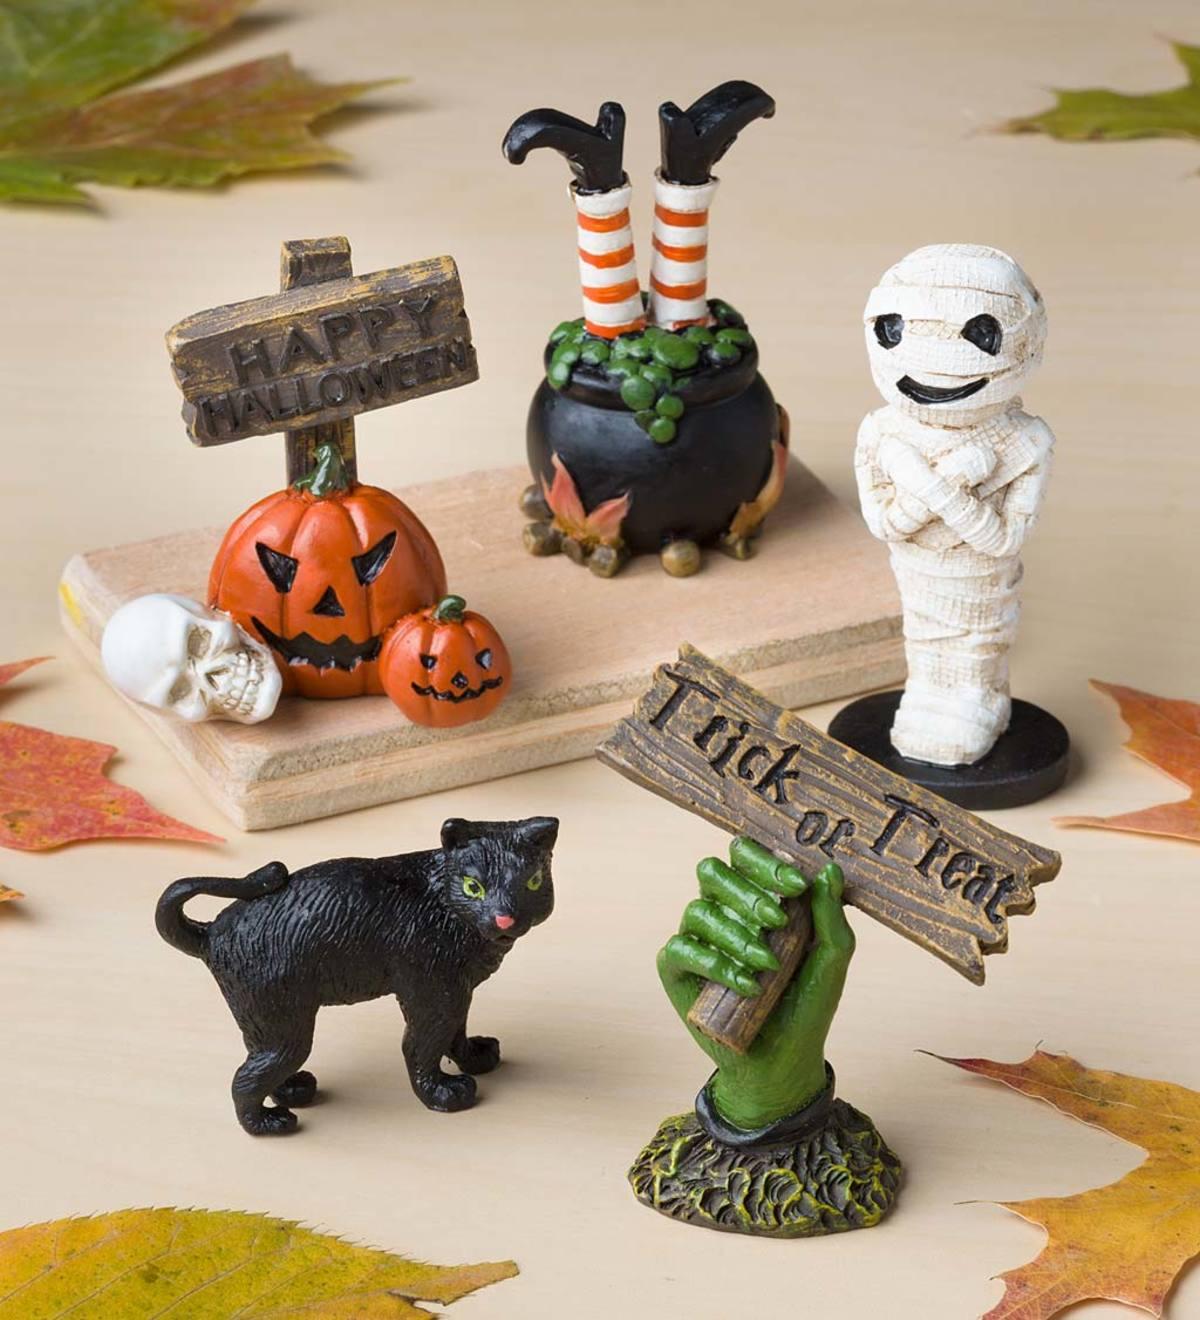 Miniature Fairy Garden Halloween Figurines Set of 5